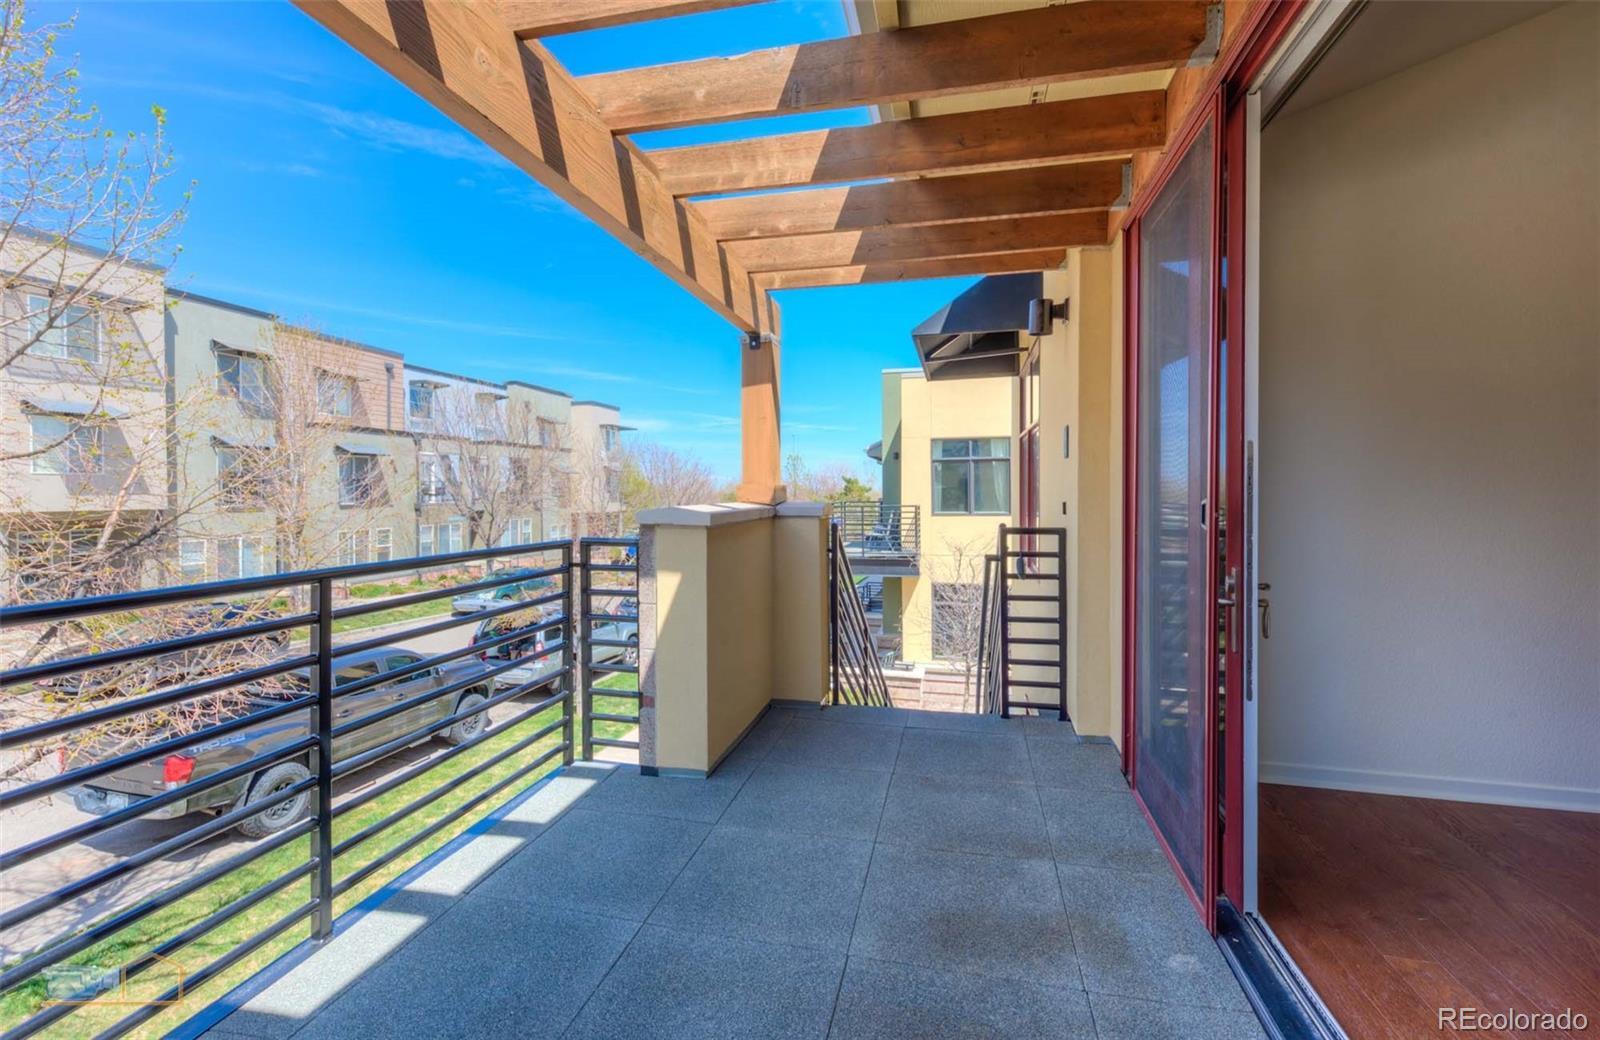 MLS# 8253378 - 3 - 1350 Rosewood Avenue, Boulder, CO 80304